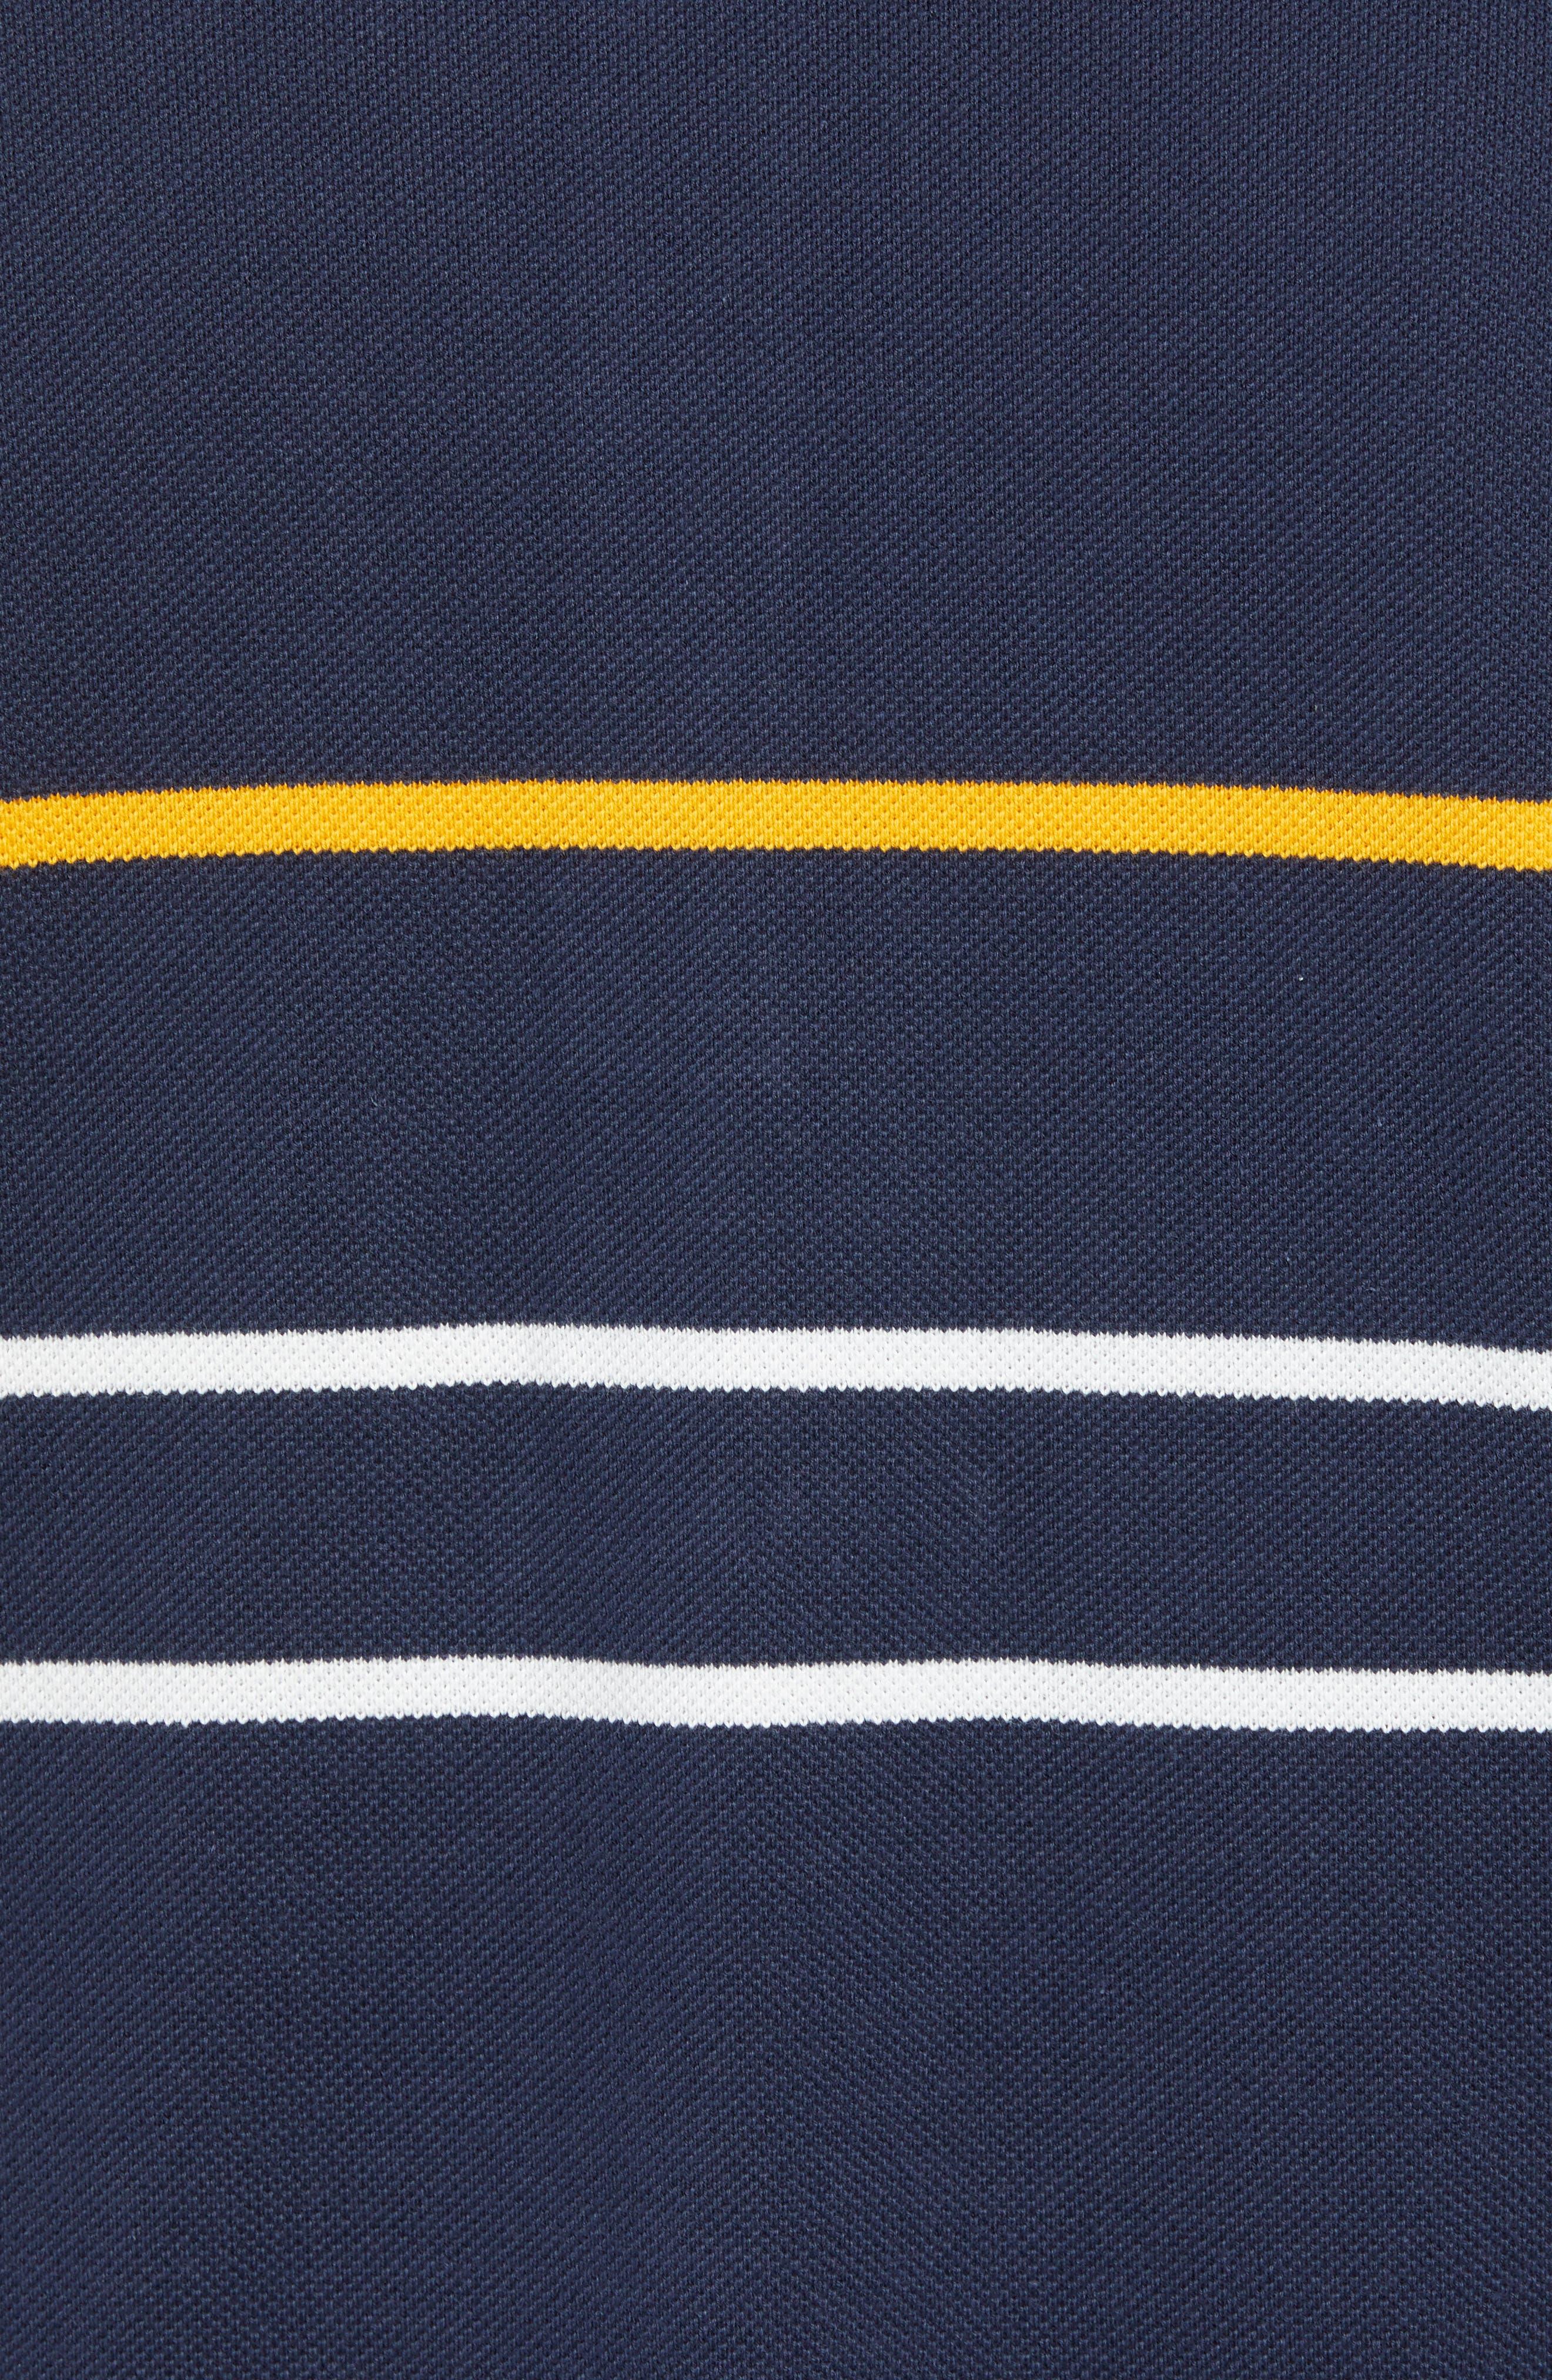 Regular Fit Stripe Cotton Polo,                             Alternate thumbnail 5, color,                             DS1 MERIDIAN BLUE/ BAOBAB-POME